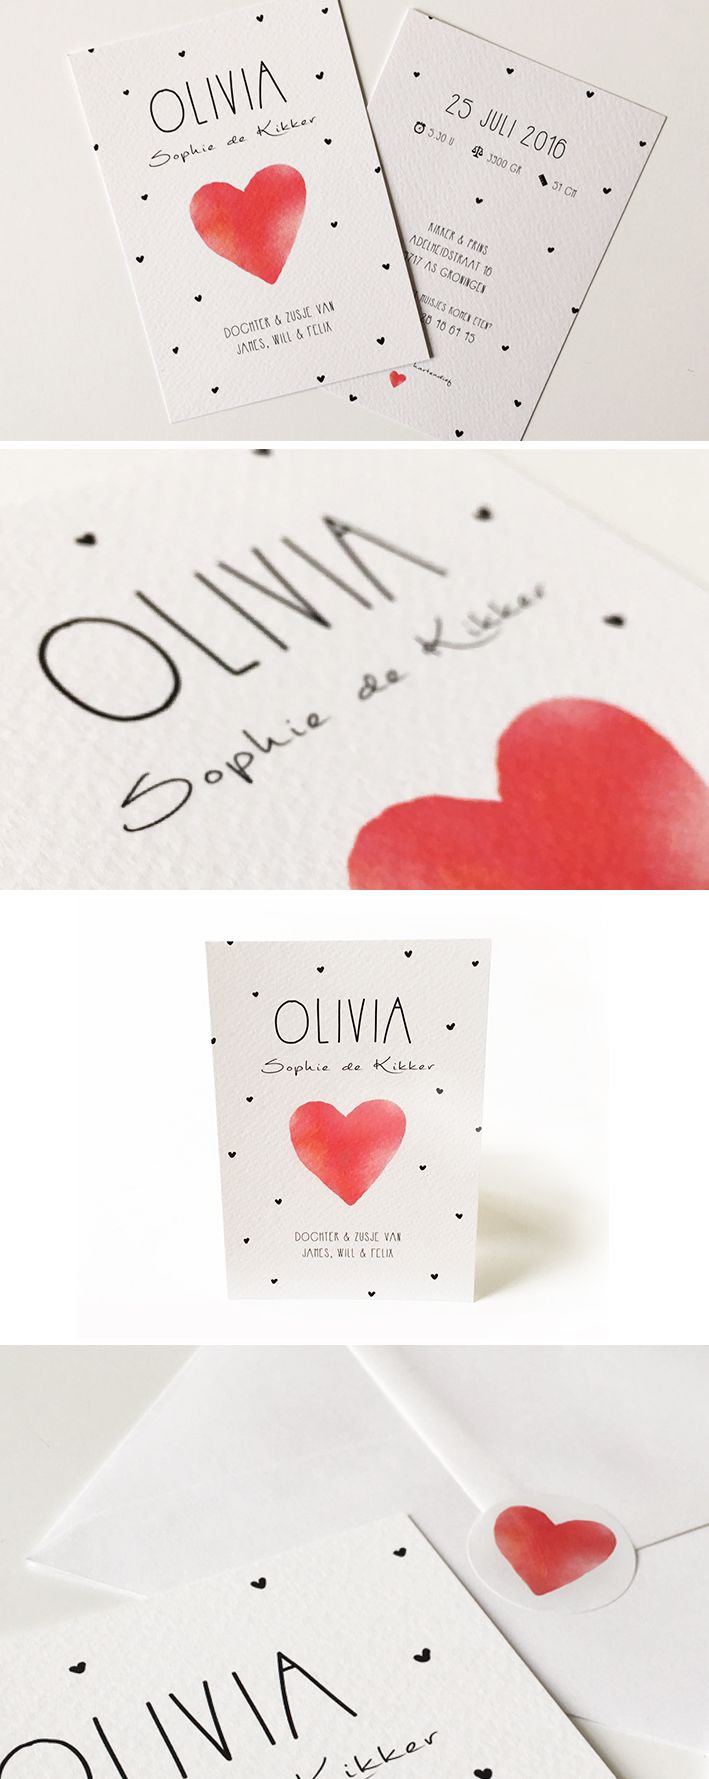 geboortekaartje_ontwerp_olivia